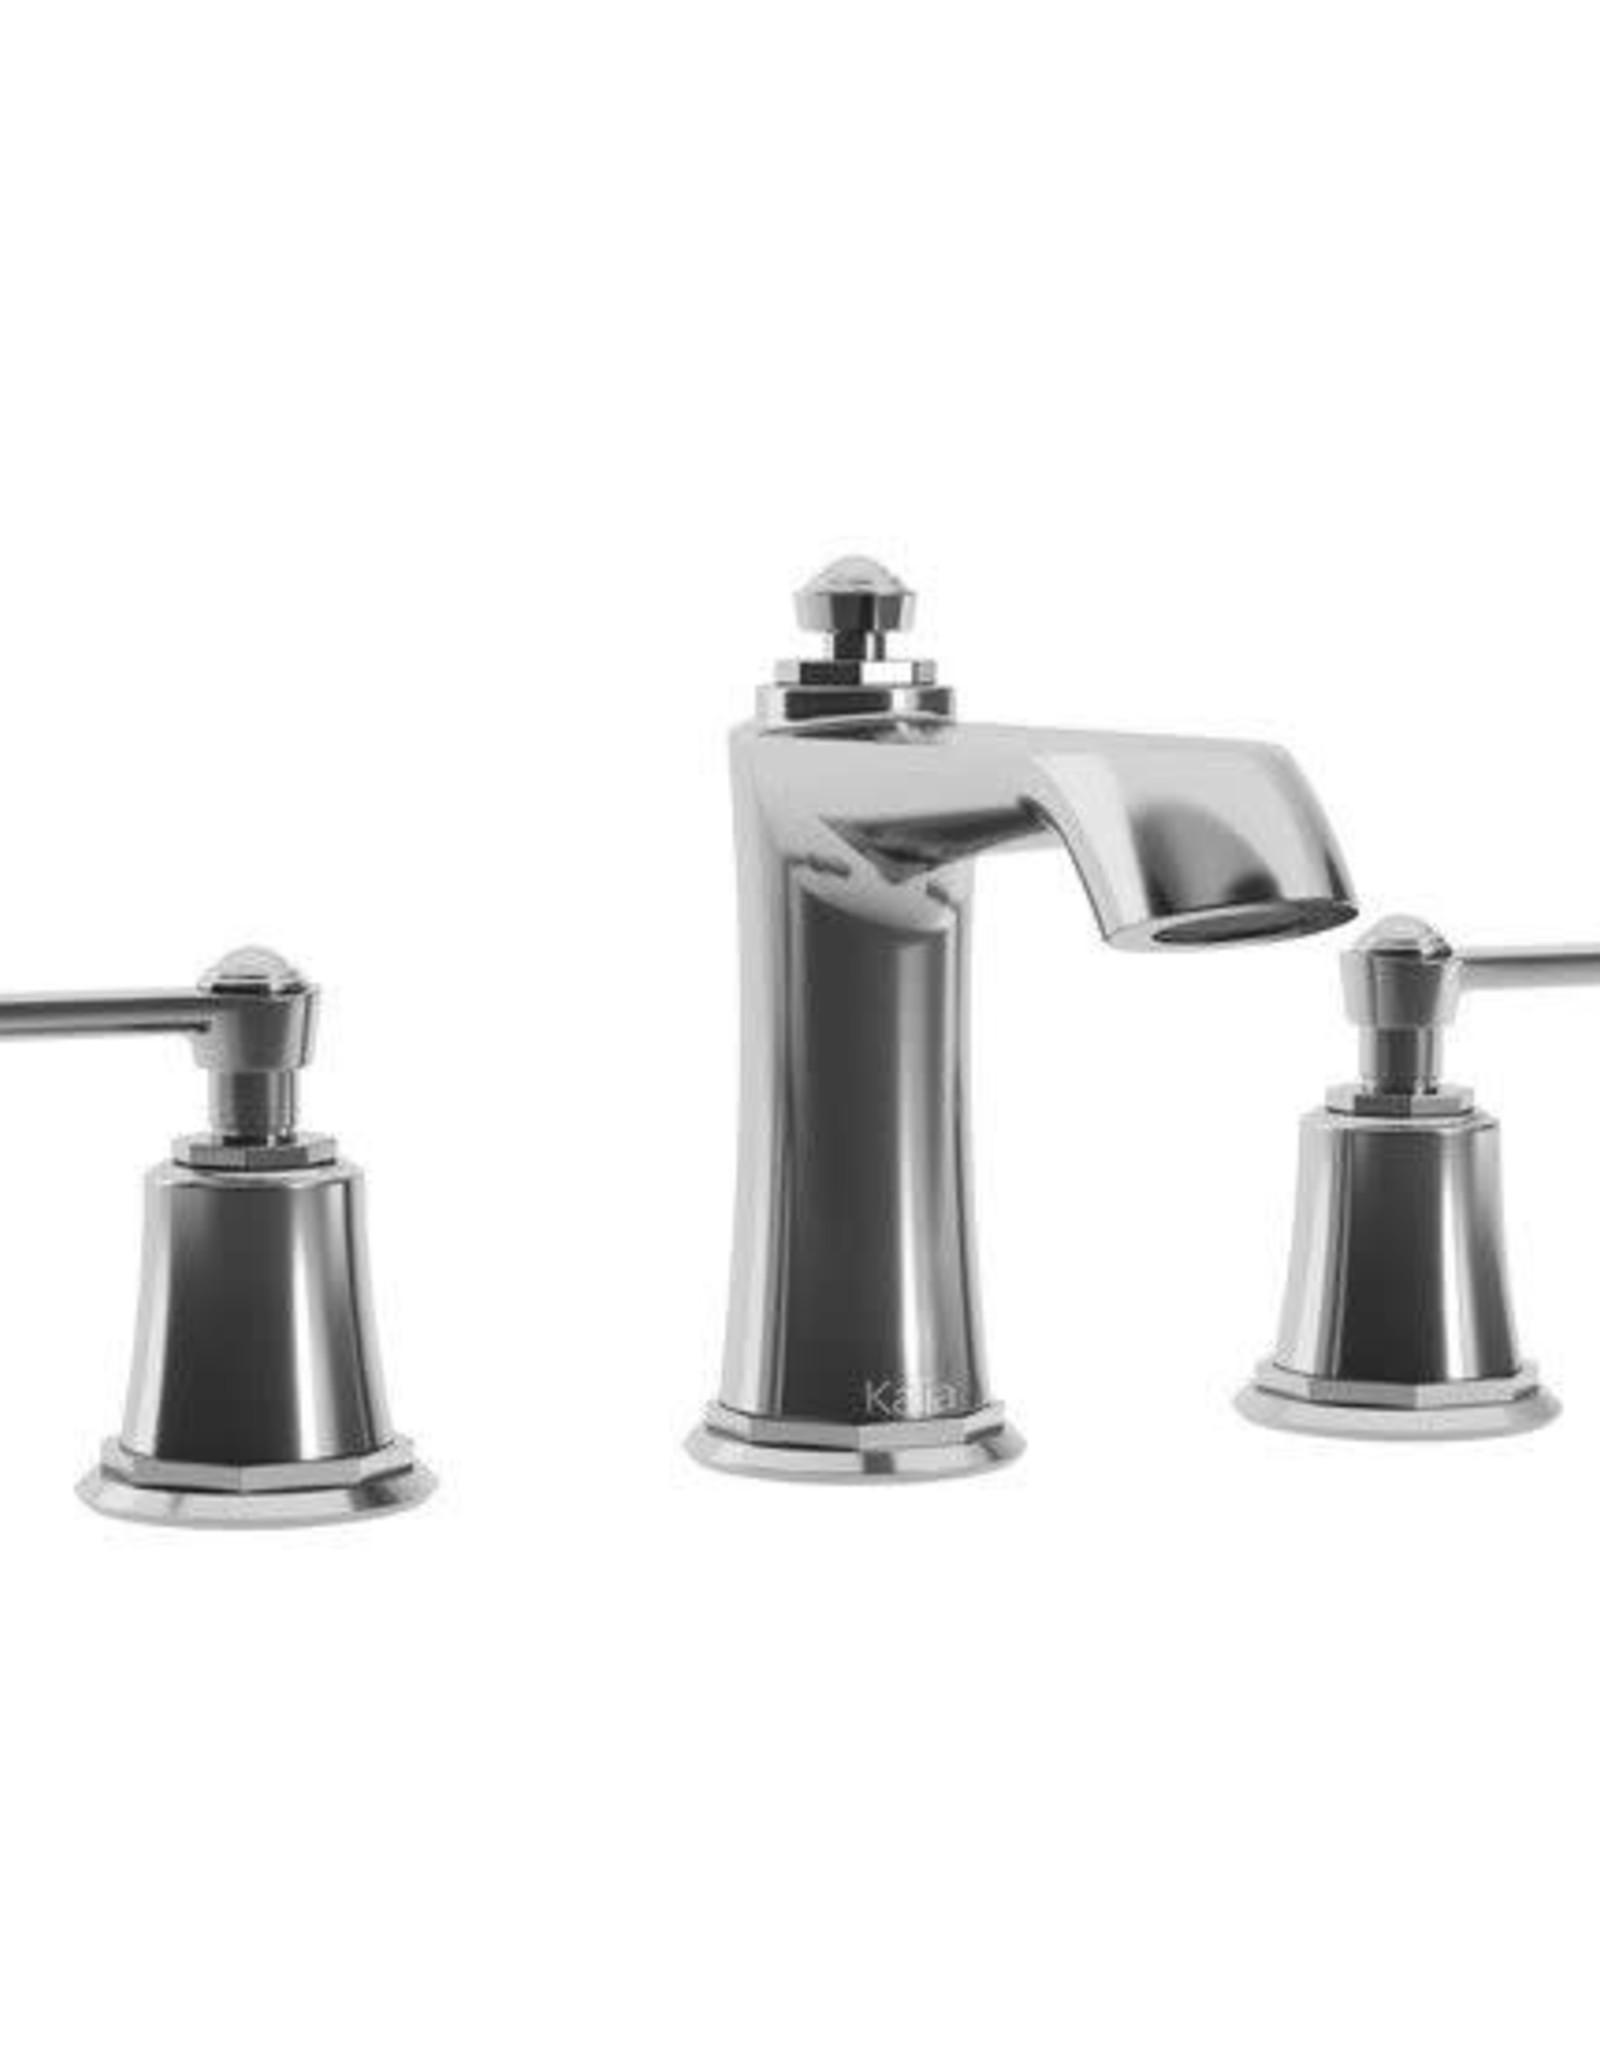 Kalia Kalia Rustik Widespread Lav Faucet- Chrome